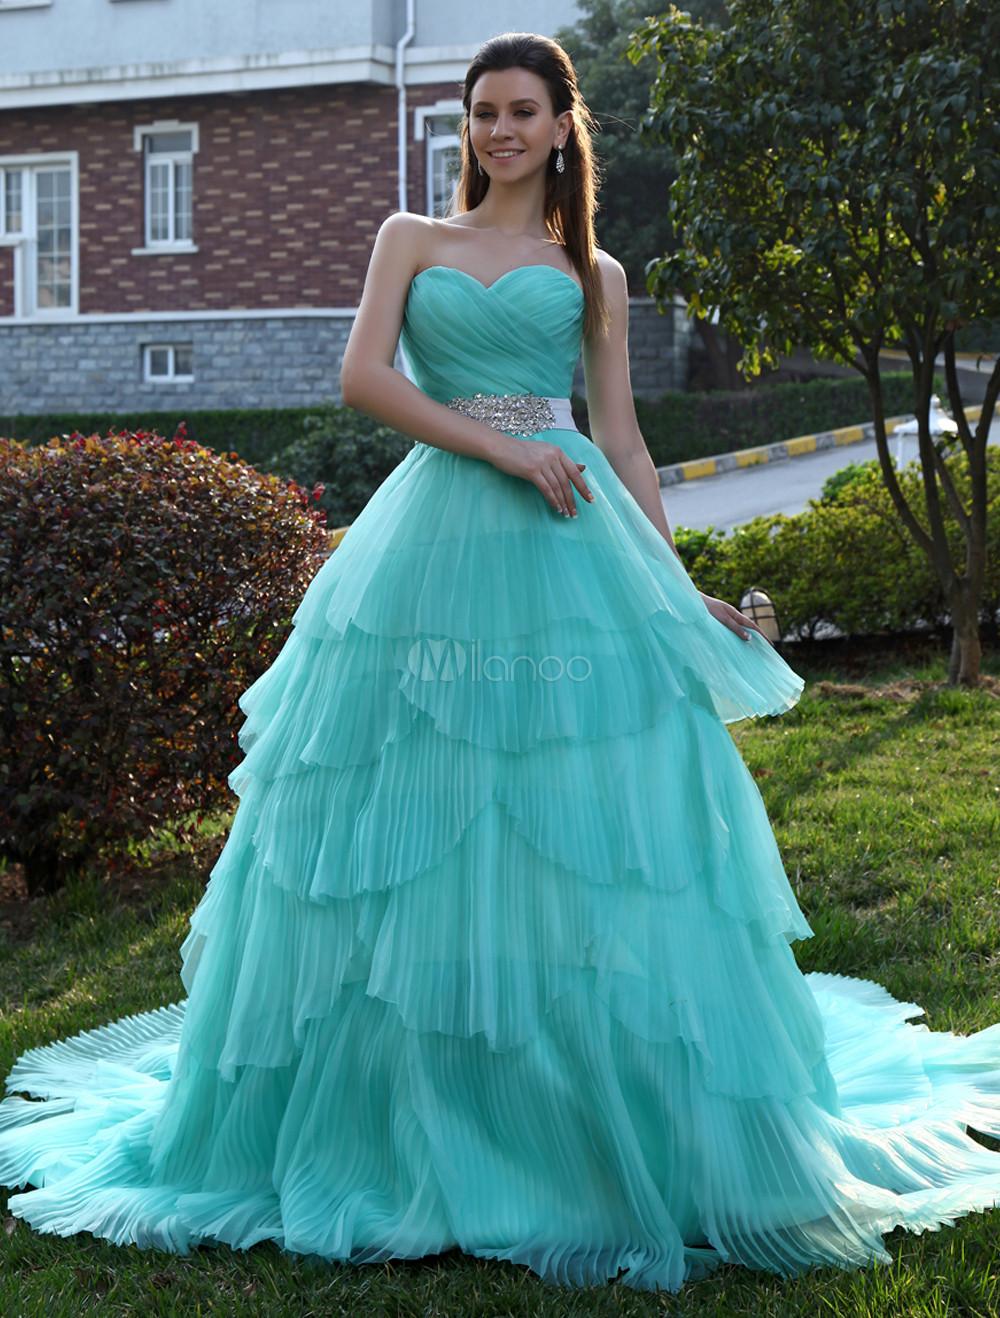 Sweetheart Neck Tiered Organza Wedding Dress Milanoo